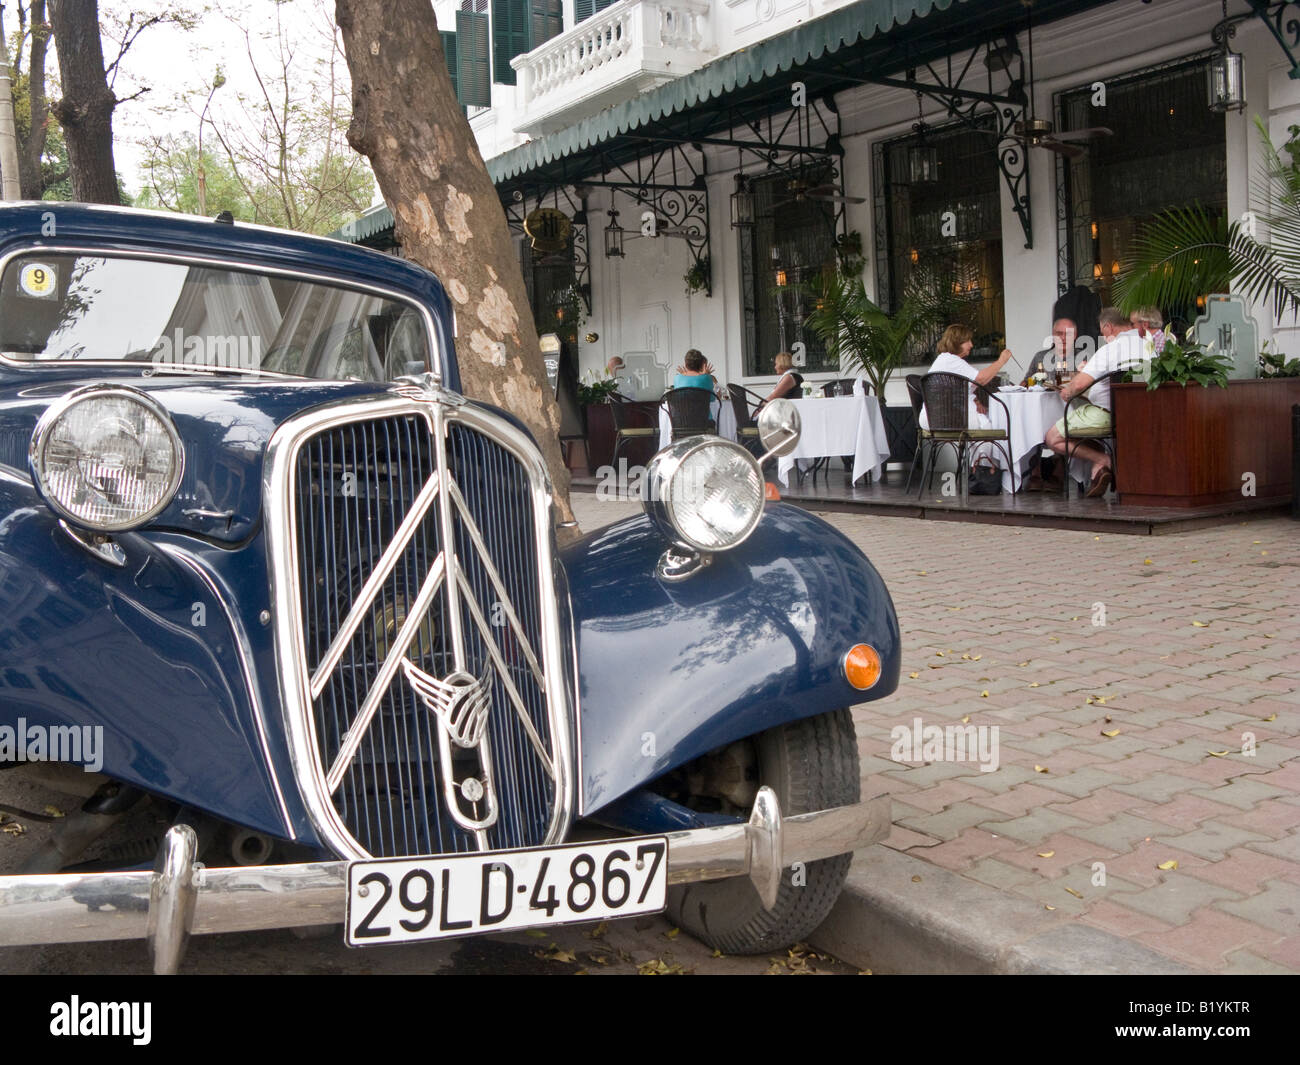 Citroen traction avant 1940s car in front of Sofitel Metropole Hotel, Hanoi, Vietnam Stock Photo